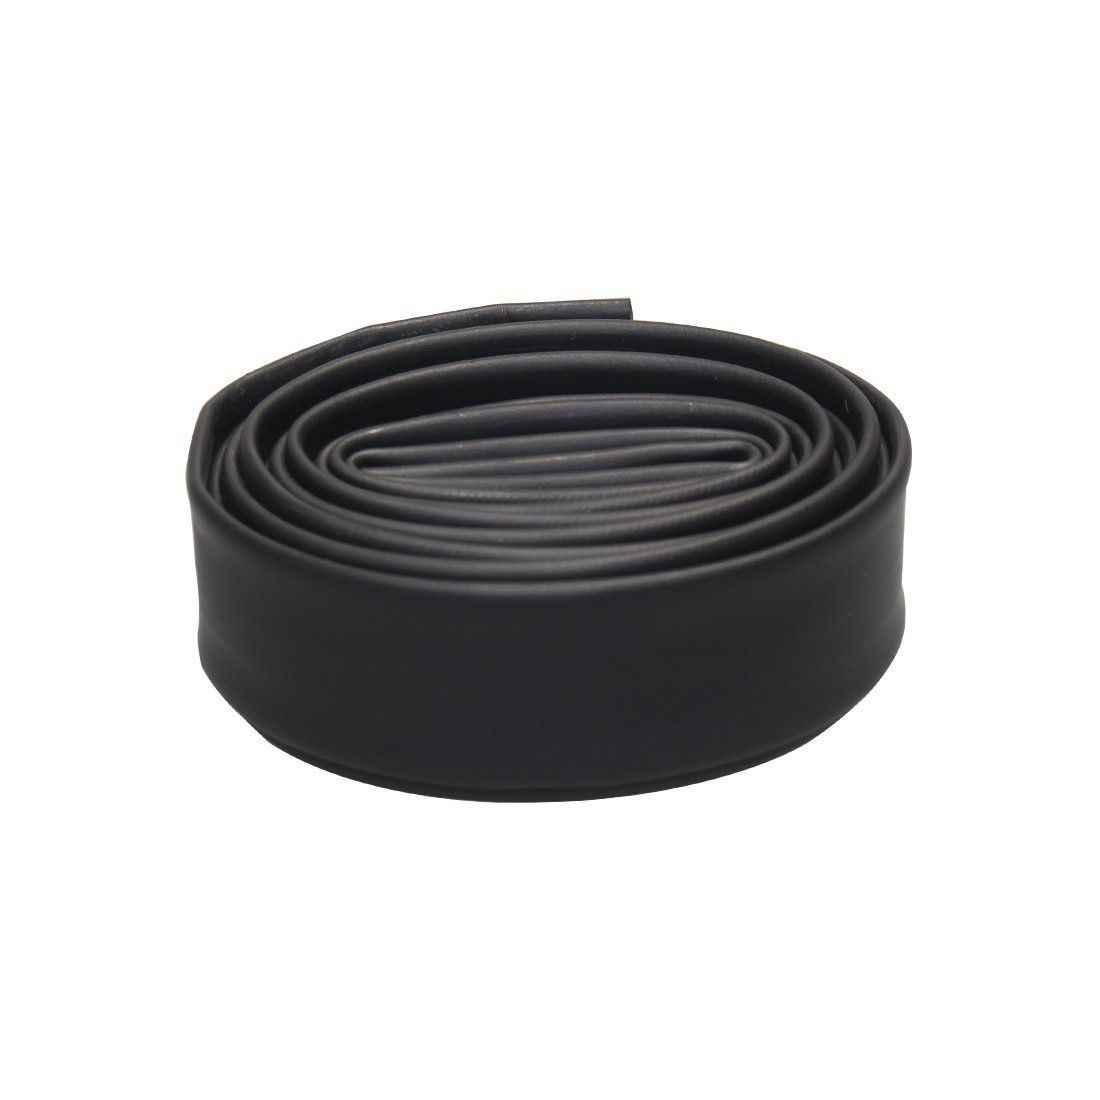 Gray Heat Shrink Tube 2:1 Electrical Sleeving Cable//Wire Heatshrink Tubing Wrap